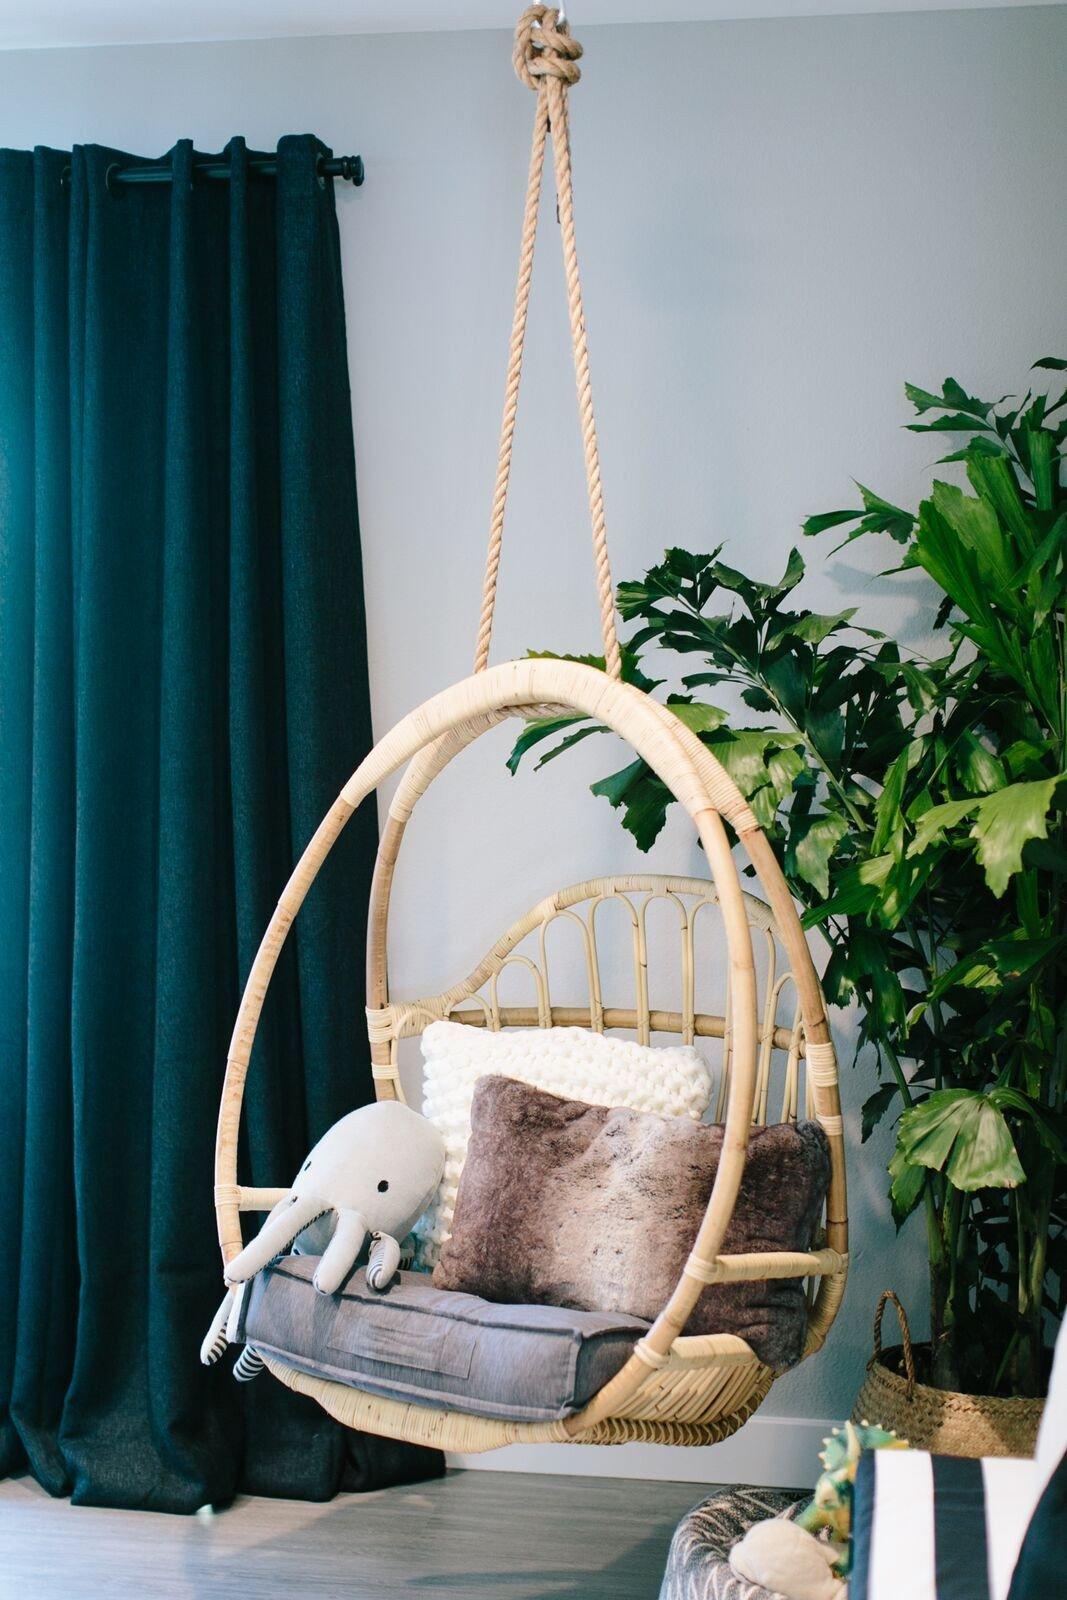 Indoor Hanging Chair for Bedroom Fresh Love This Little Cozy Kidz Corner that as Seen On Hgtv S